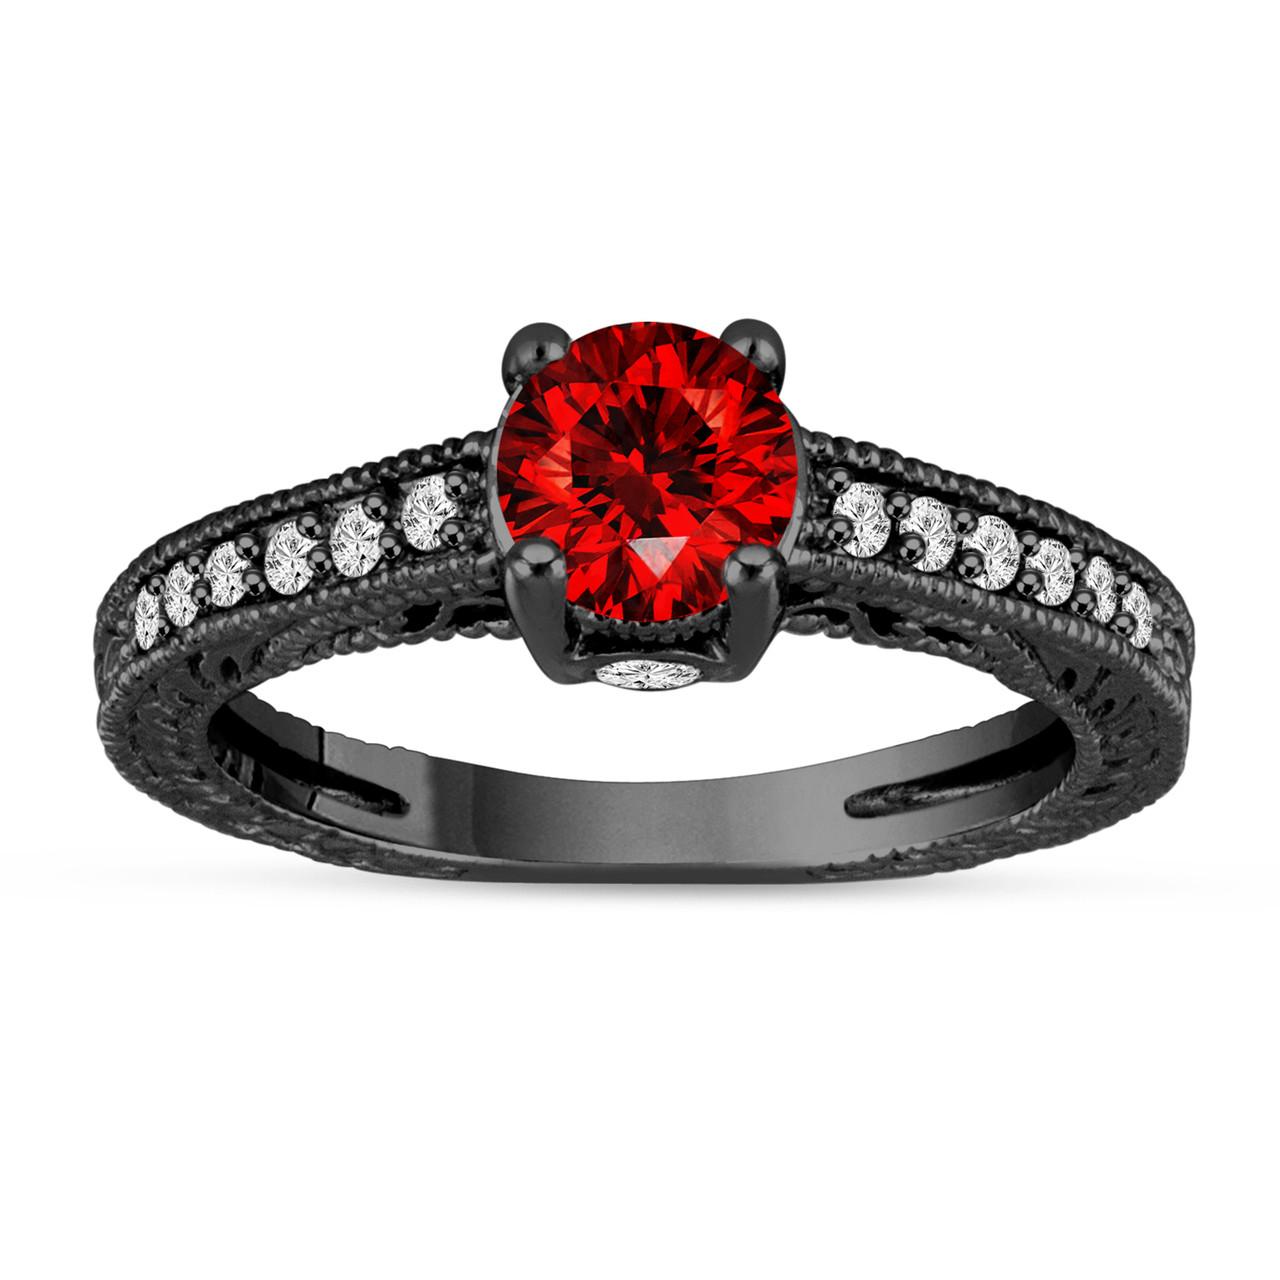 Fancy Red Diamond Engagement Ring 14K Black Gold Vintage